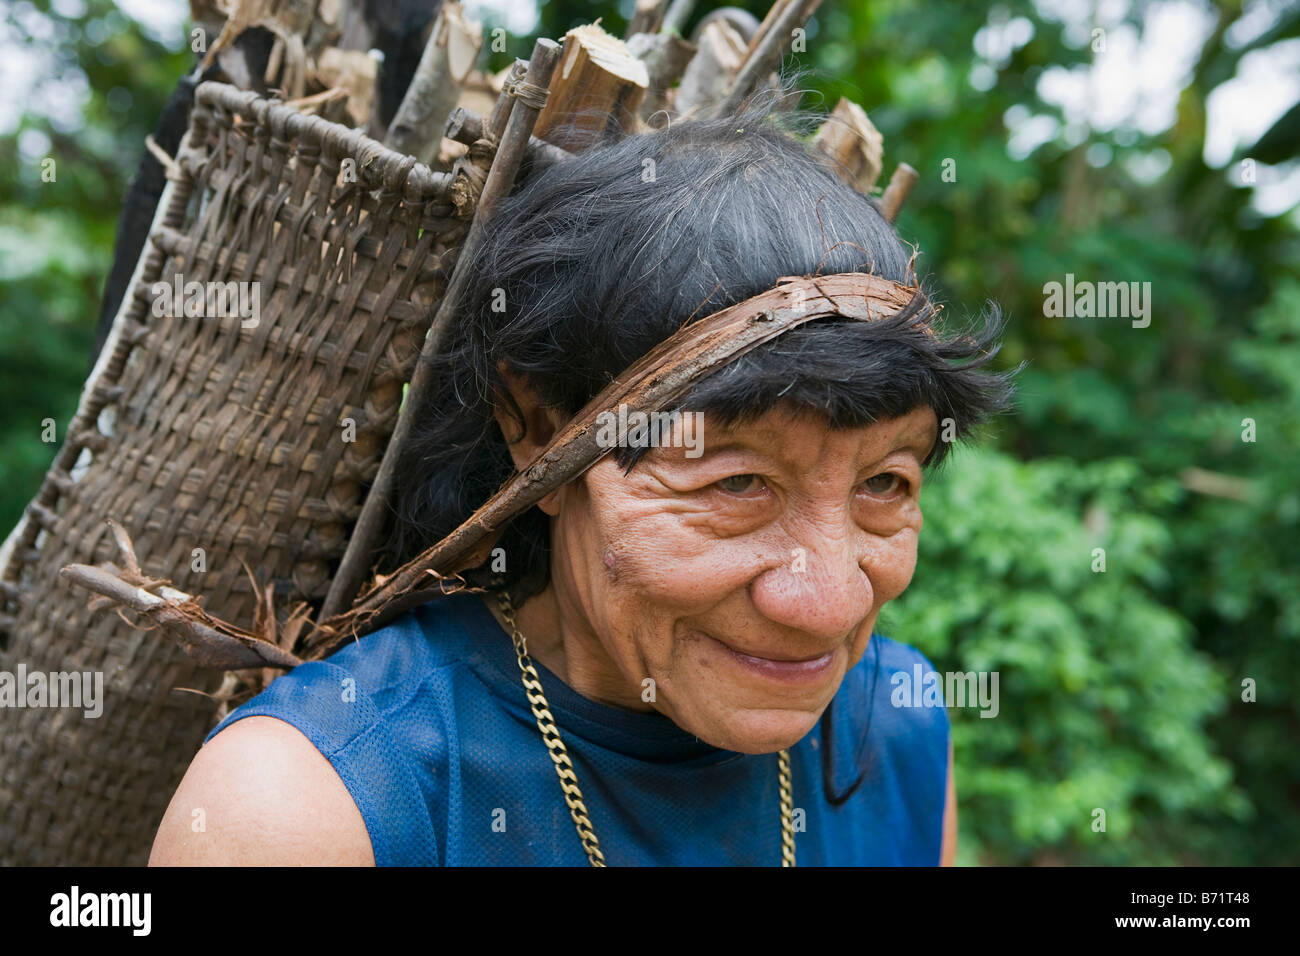 Suriname, Kwamalasamutu, home of indigenous Indians. Akurio Indian man carrying fire wood. - Stock Image